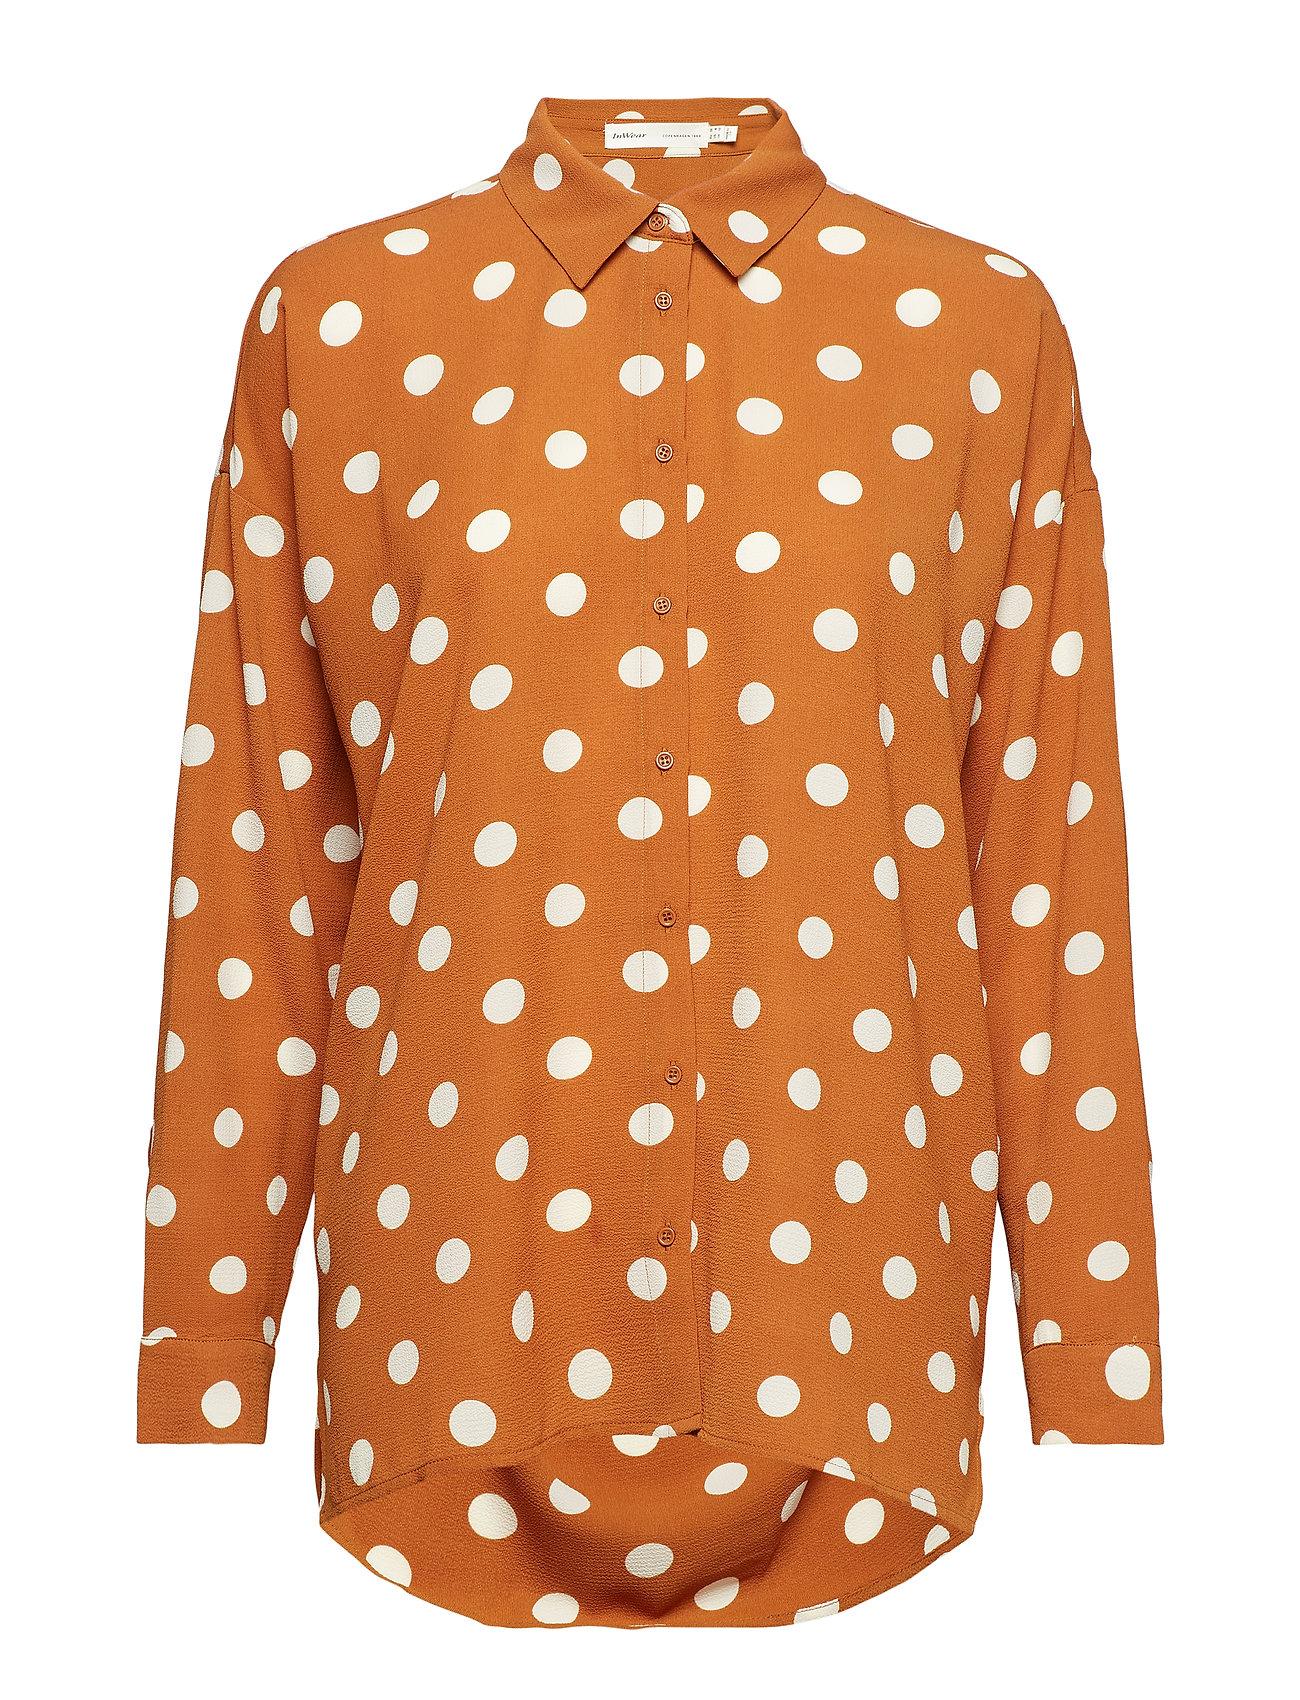 InWear Zibi Hattie Shirt Ögrönlar